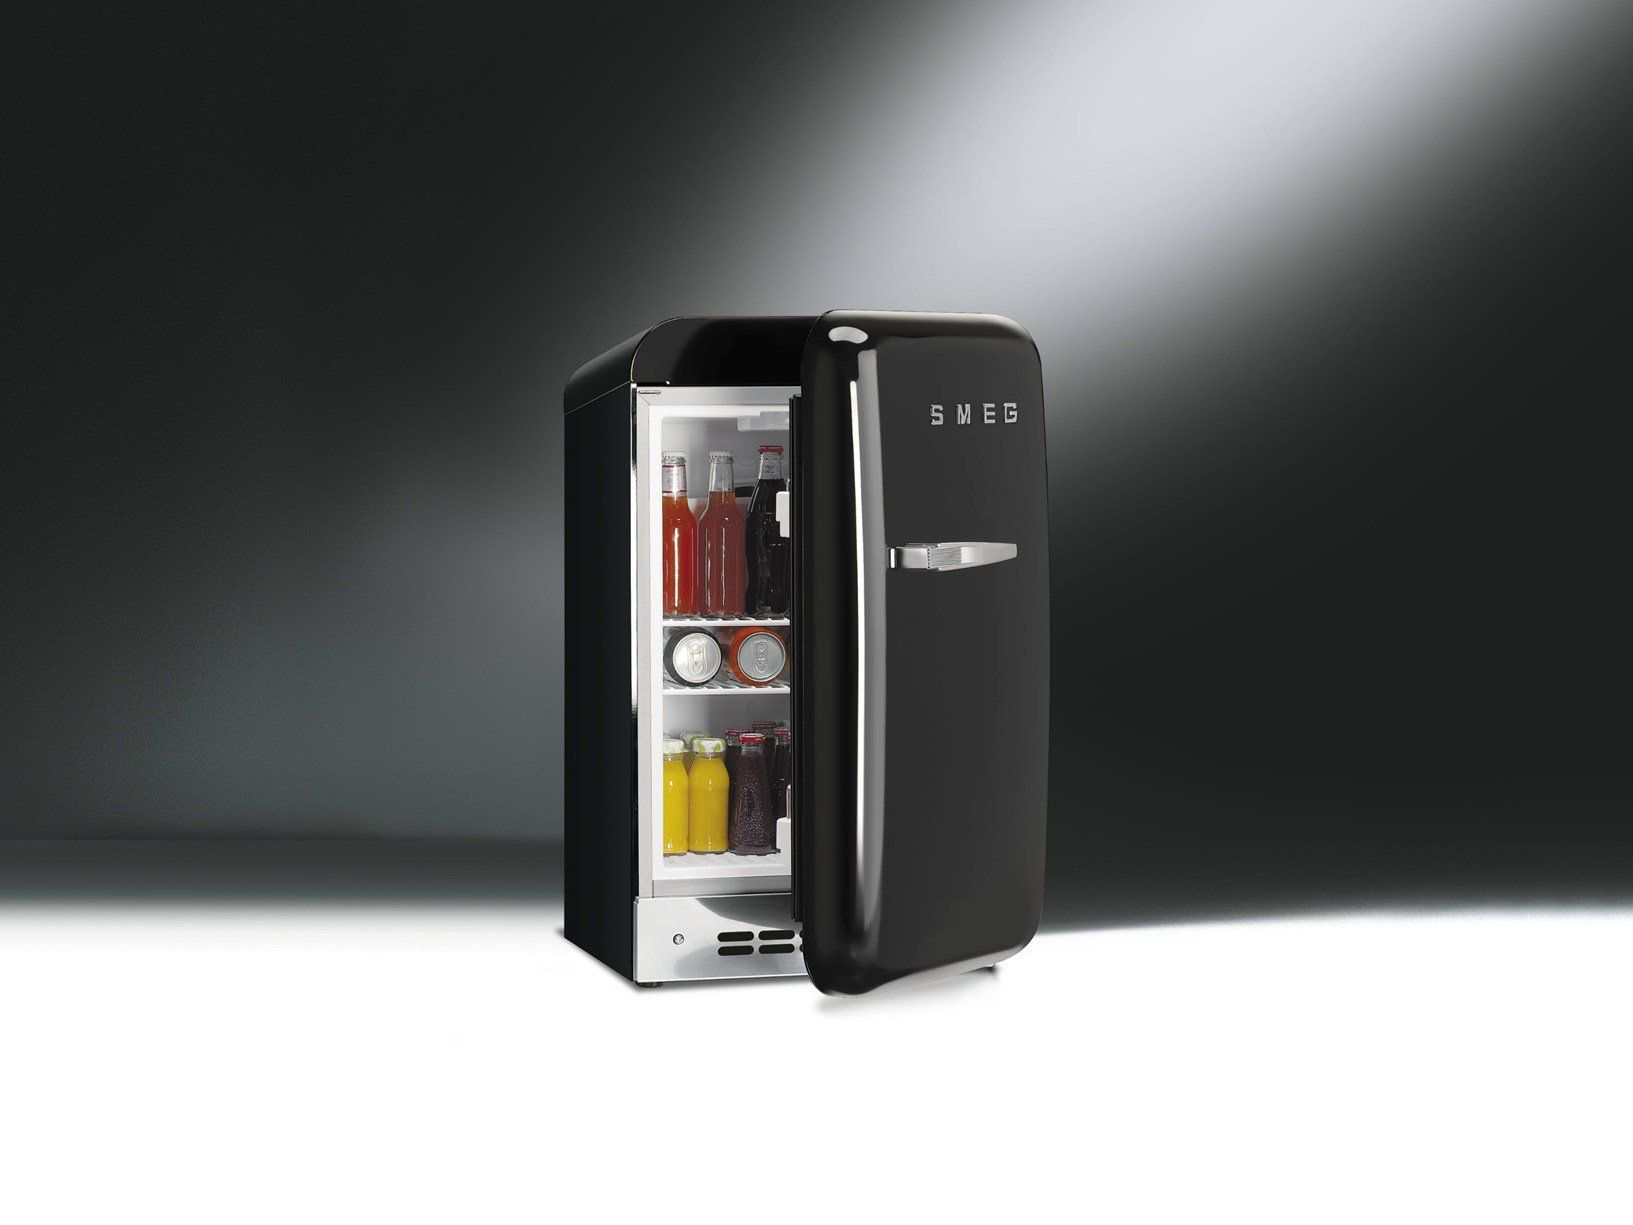 Frigo Smeg Anni 50 Piccolo smeg presenta il nuovo mini-frigo fab5